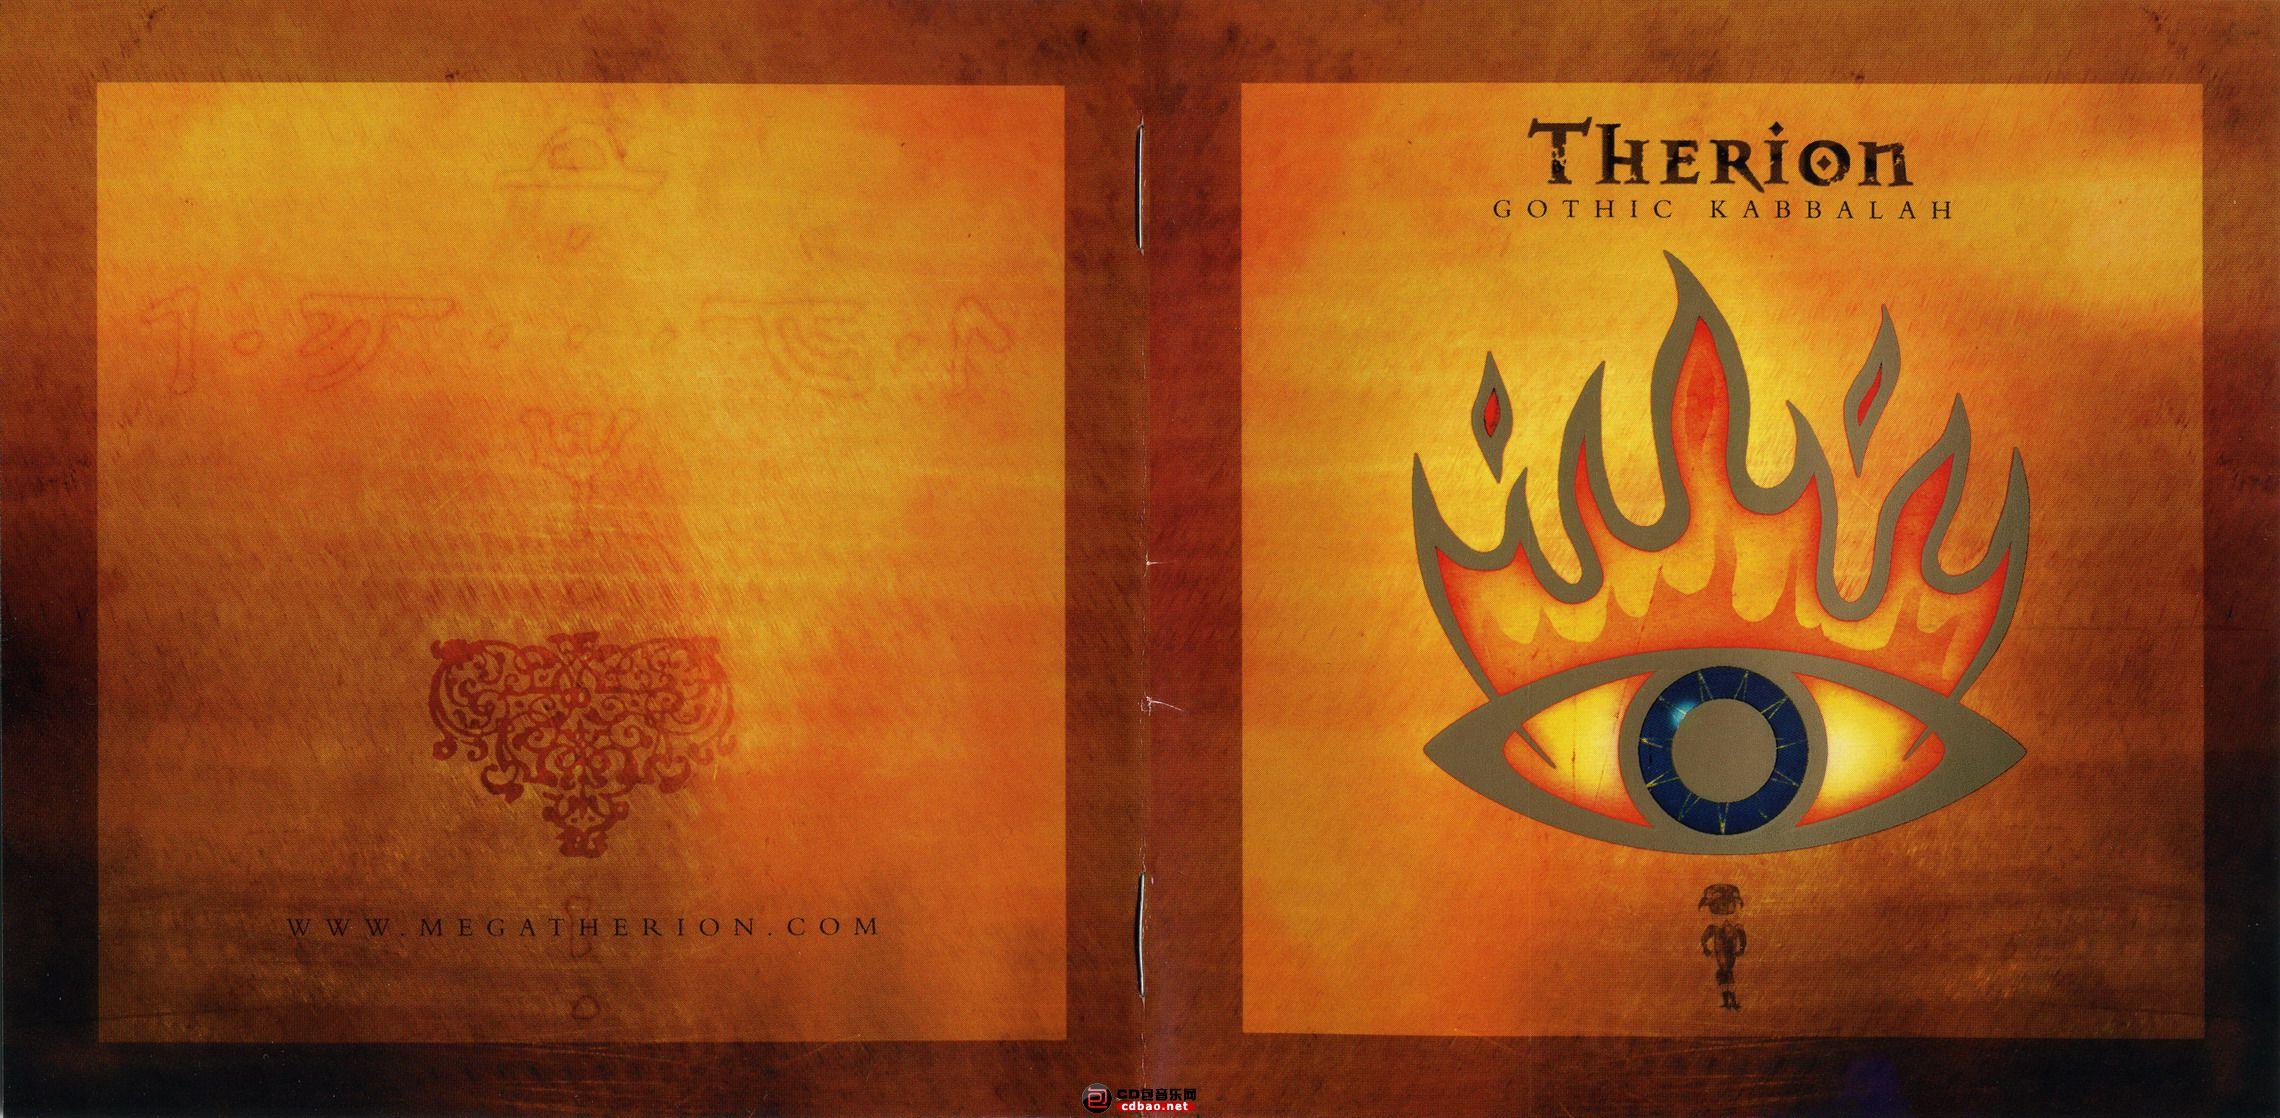 Therion - Gothic Kabbalah F.jpg